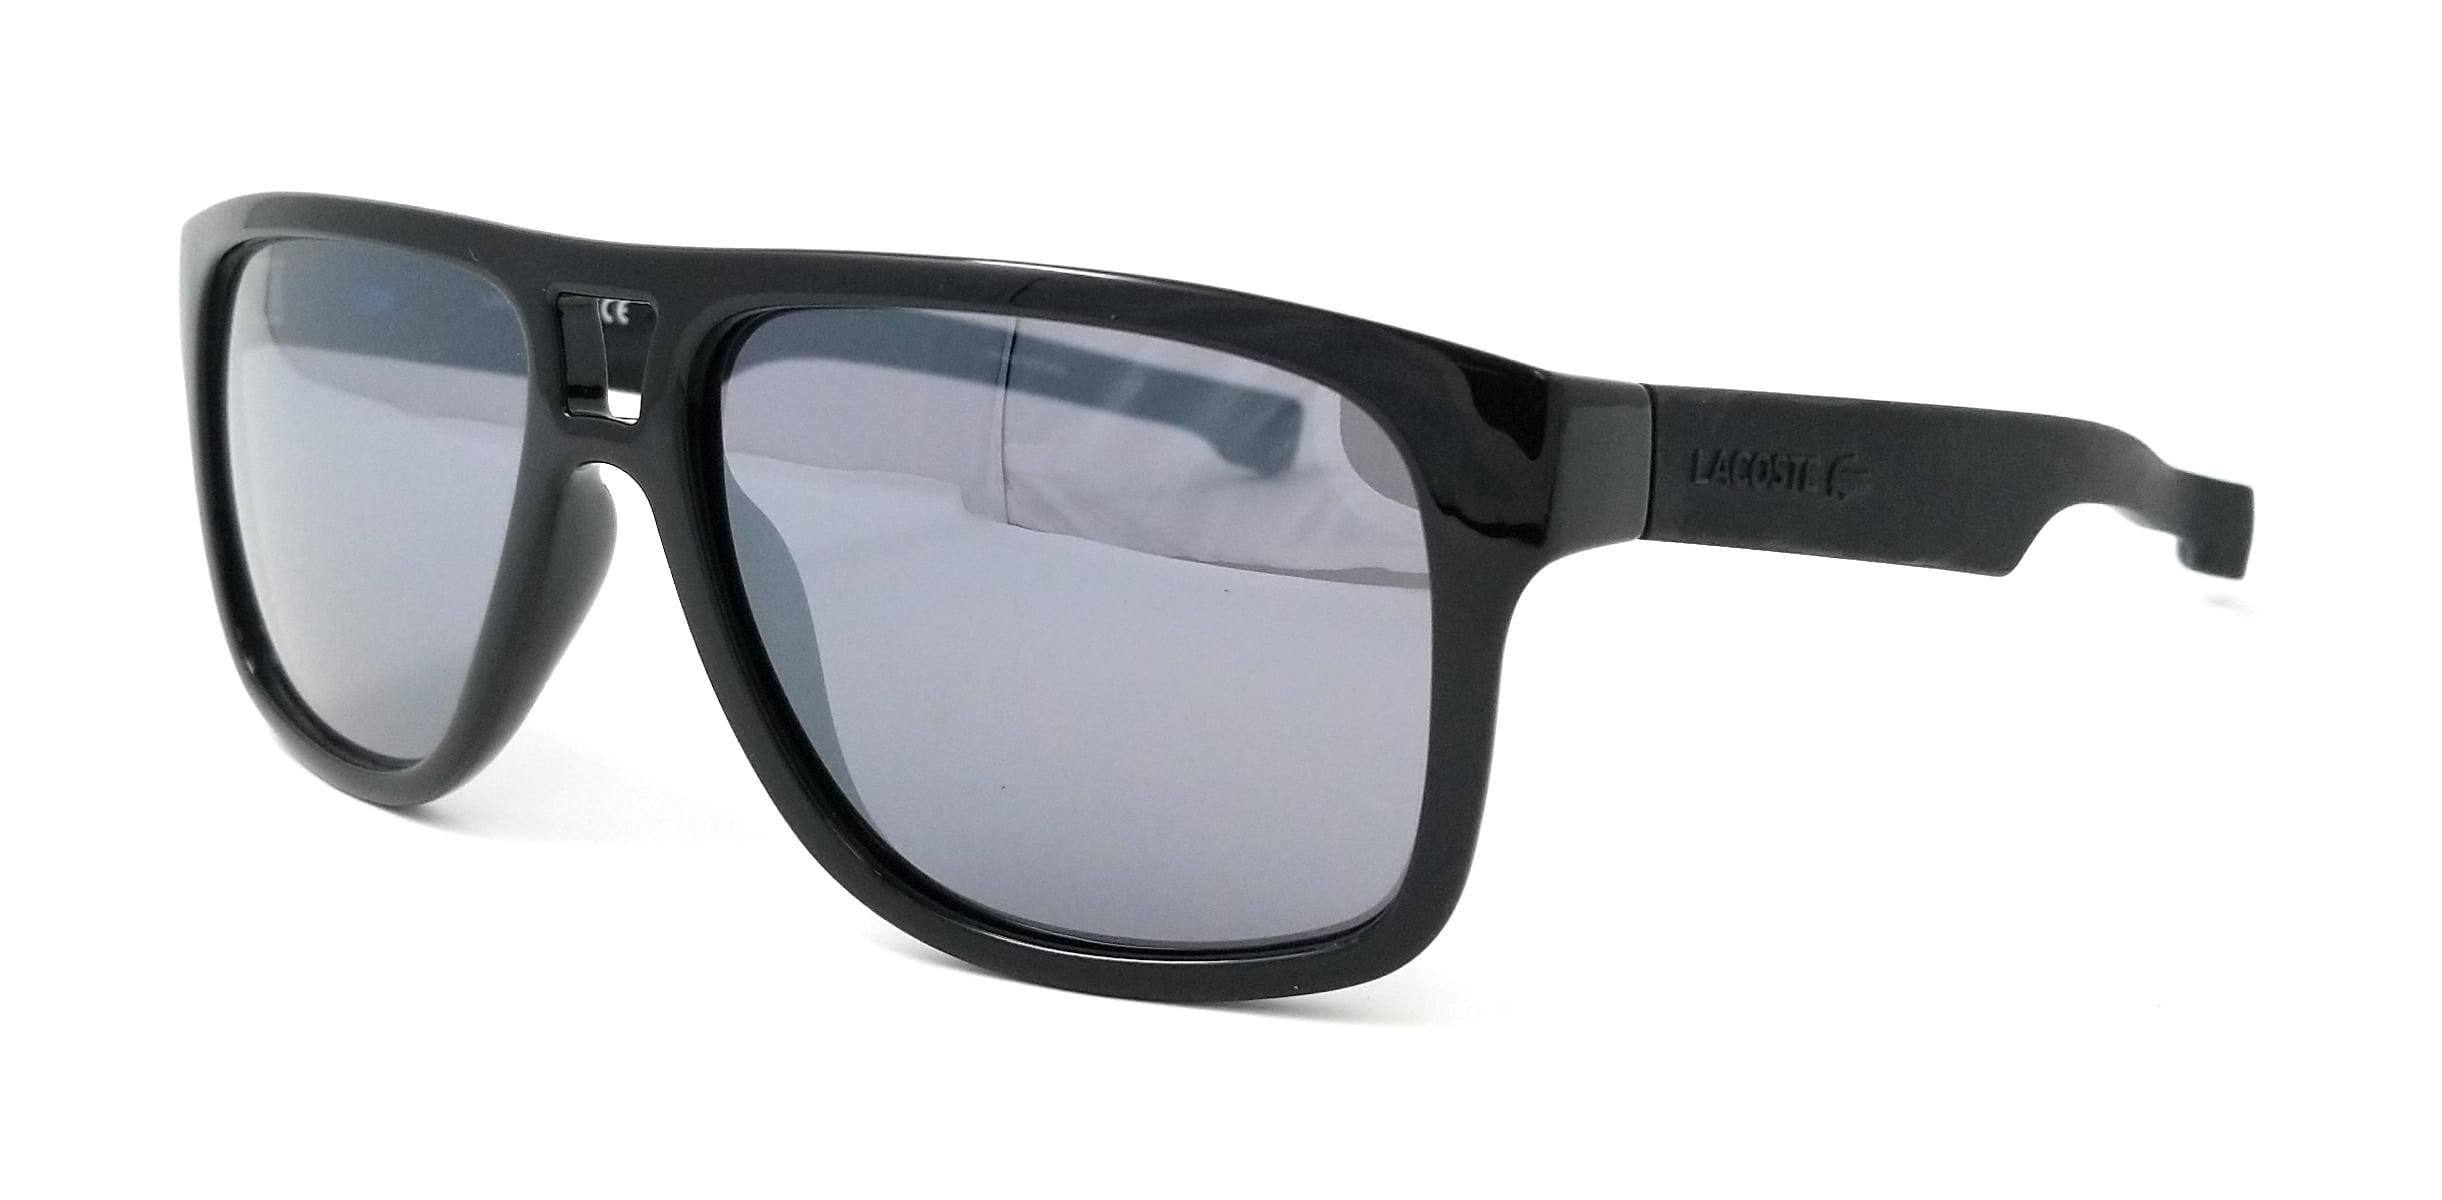 e1e76ca216b6 Lacoste - LACOSTE Sunglasses L817S 001 Black Rectangular Mens 57x15x140 -  Walmart.com